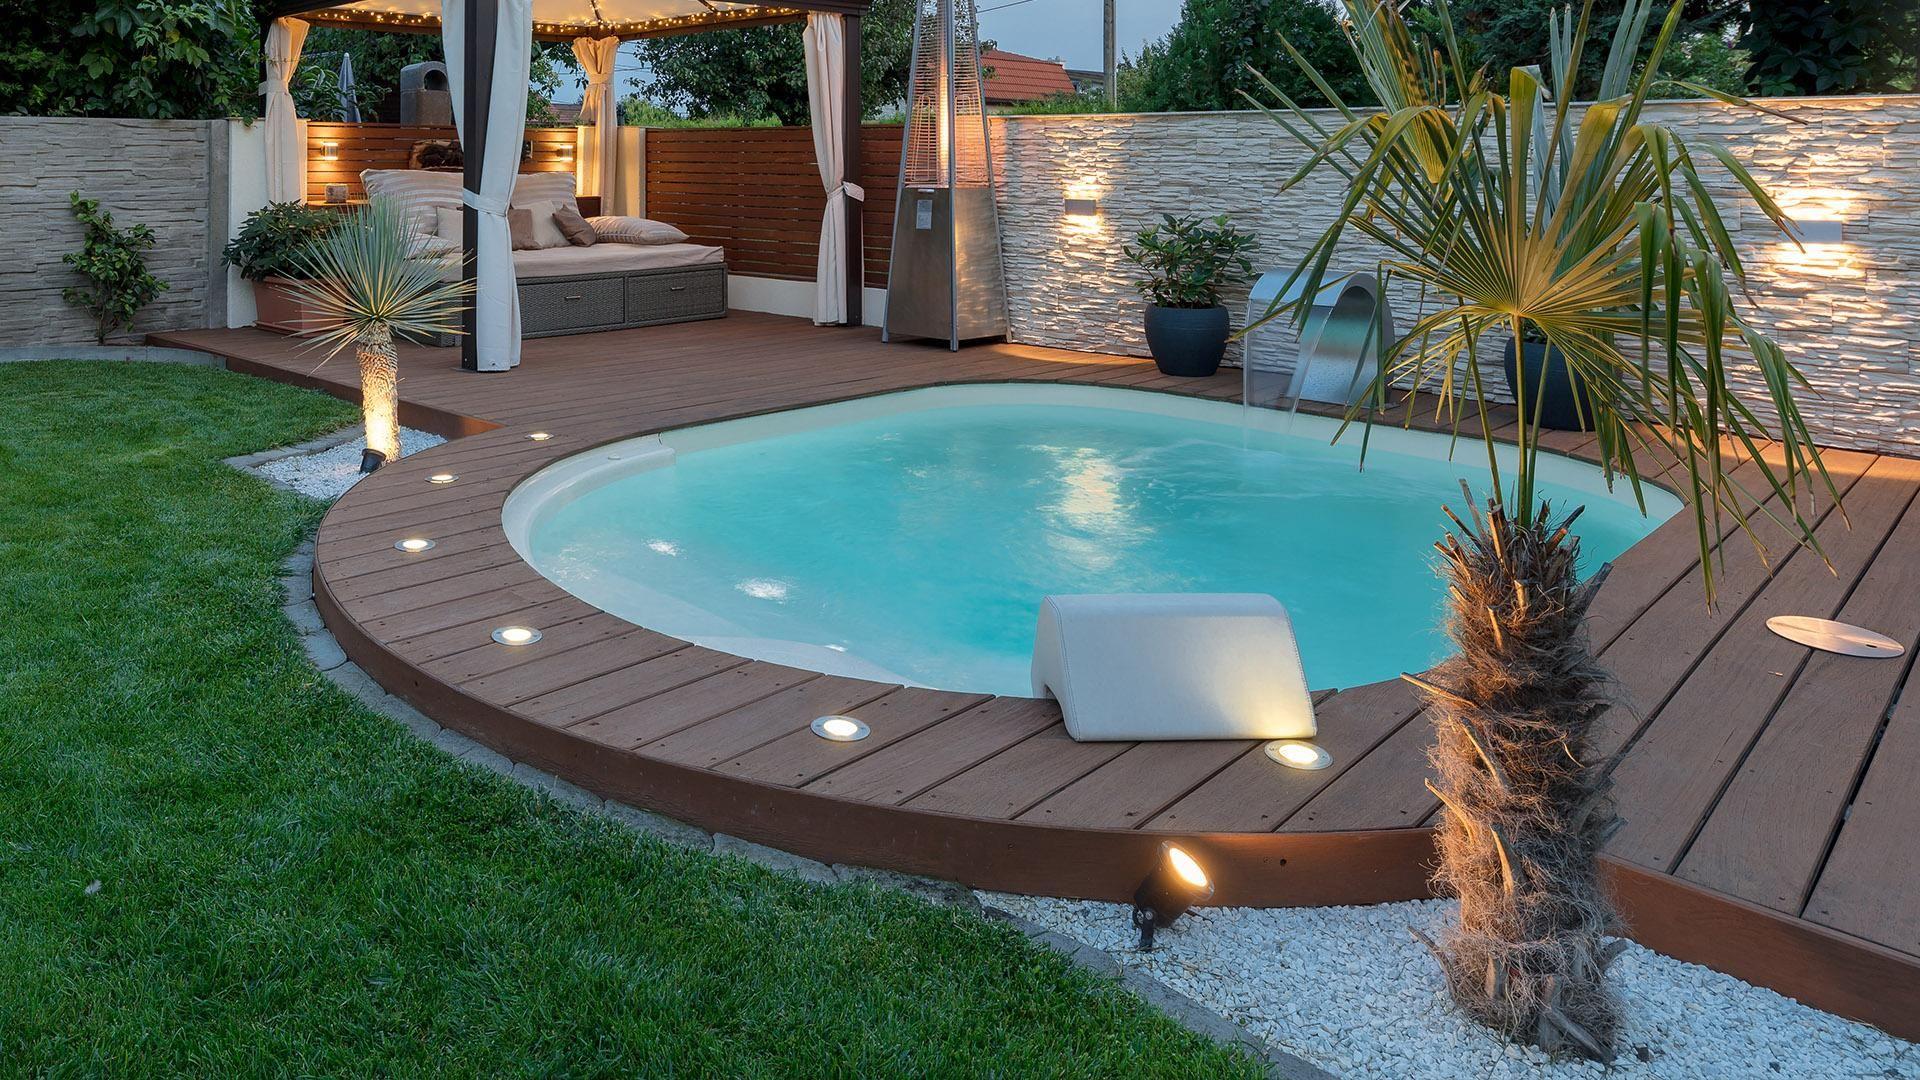 The Lola Mini Pool Waterair Swimming Pools With Images Mini